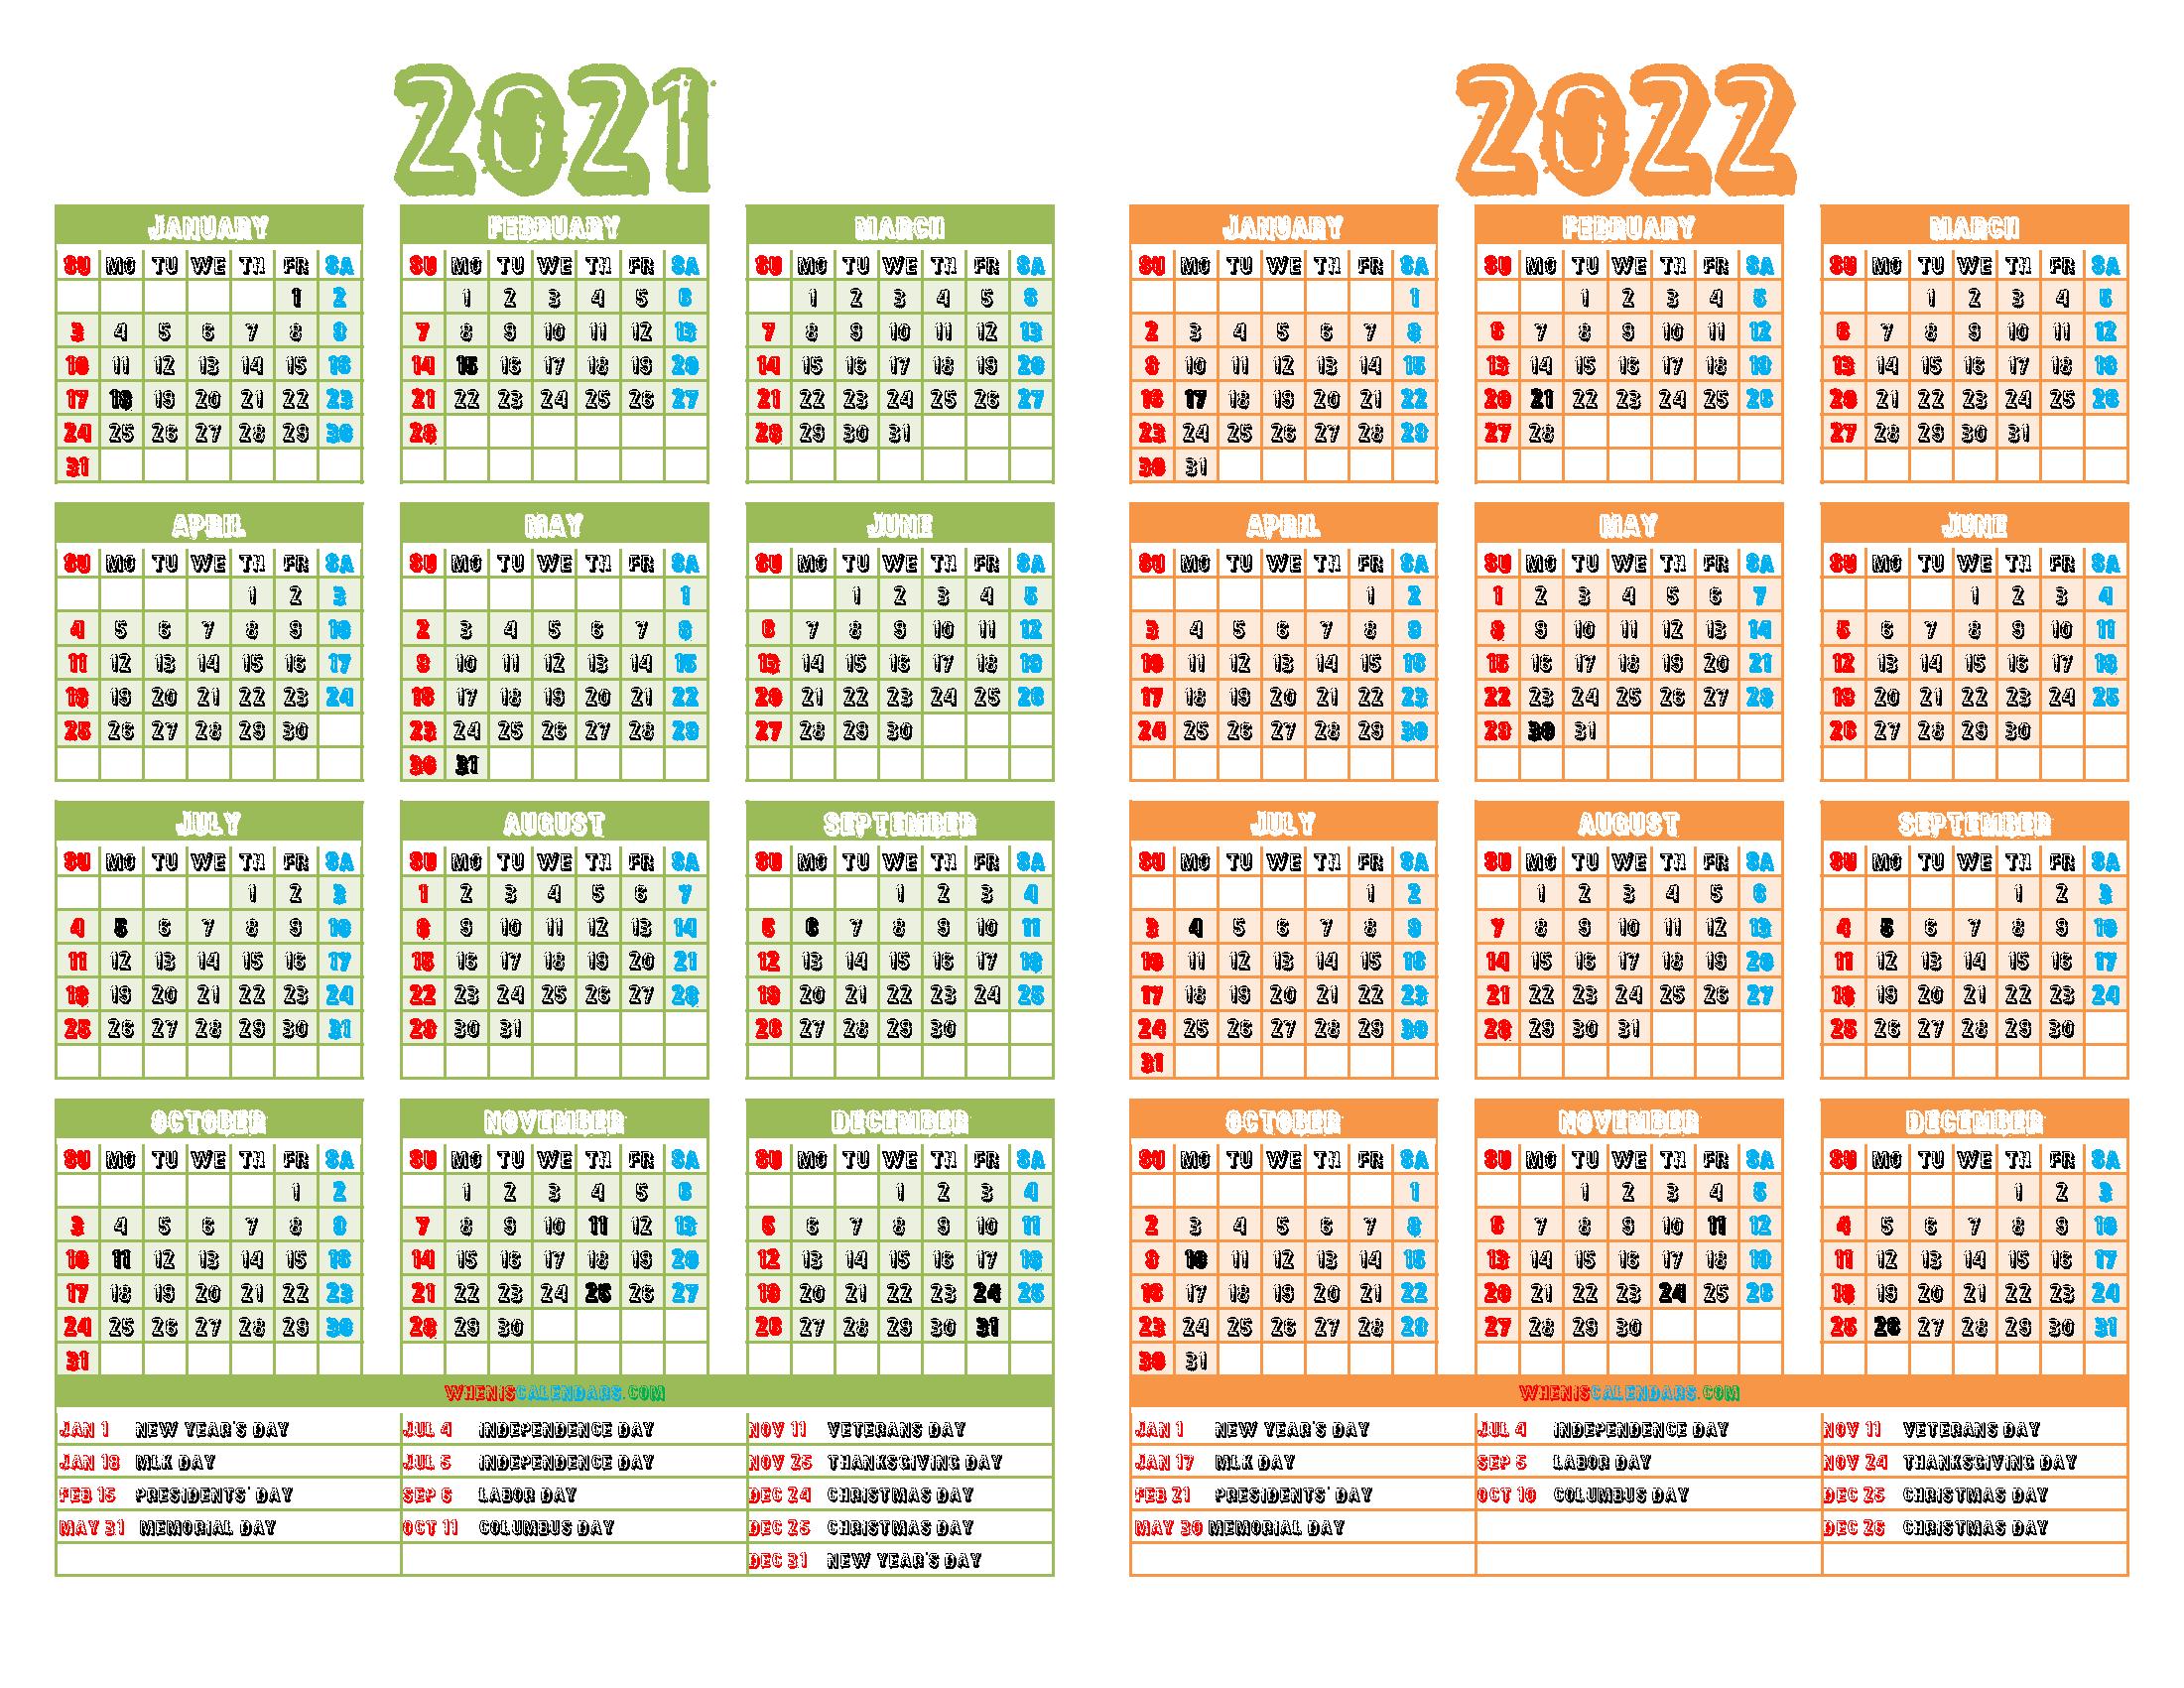 2021 and 2022 Printable Calendar with Holidays